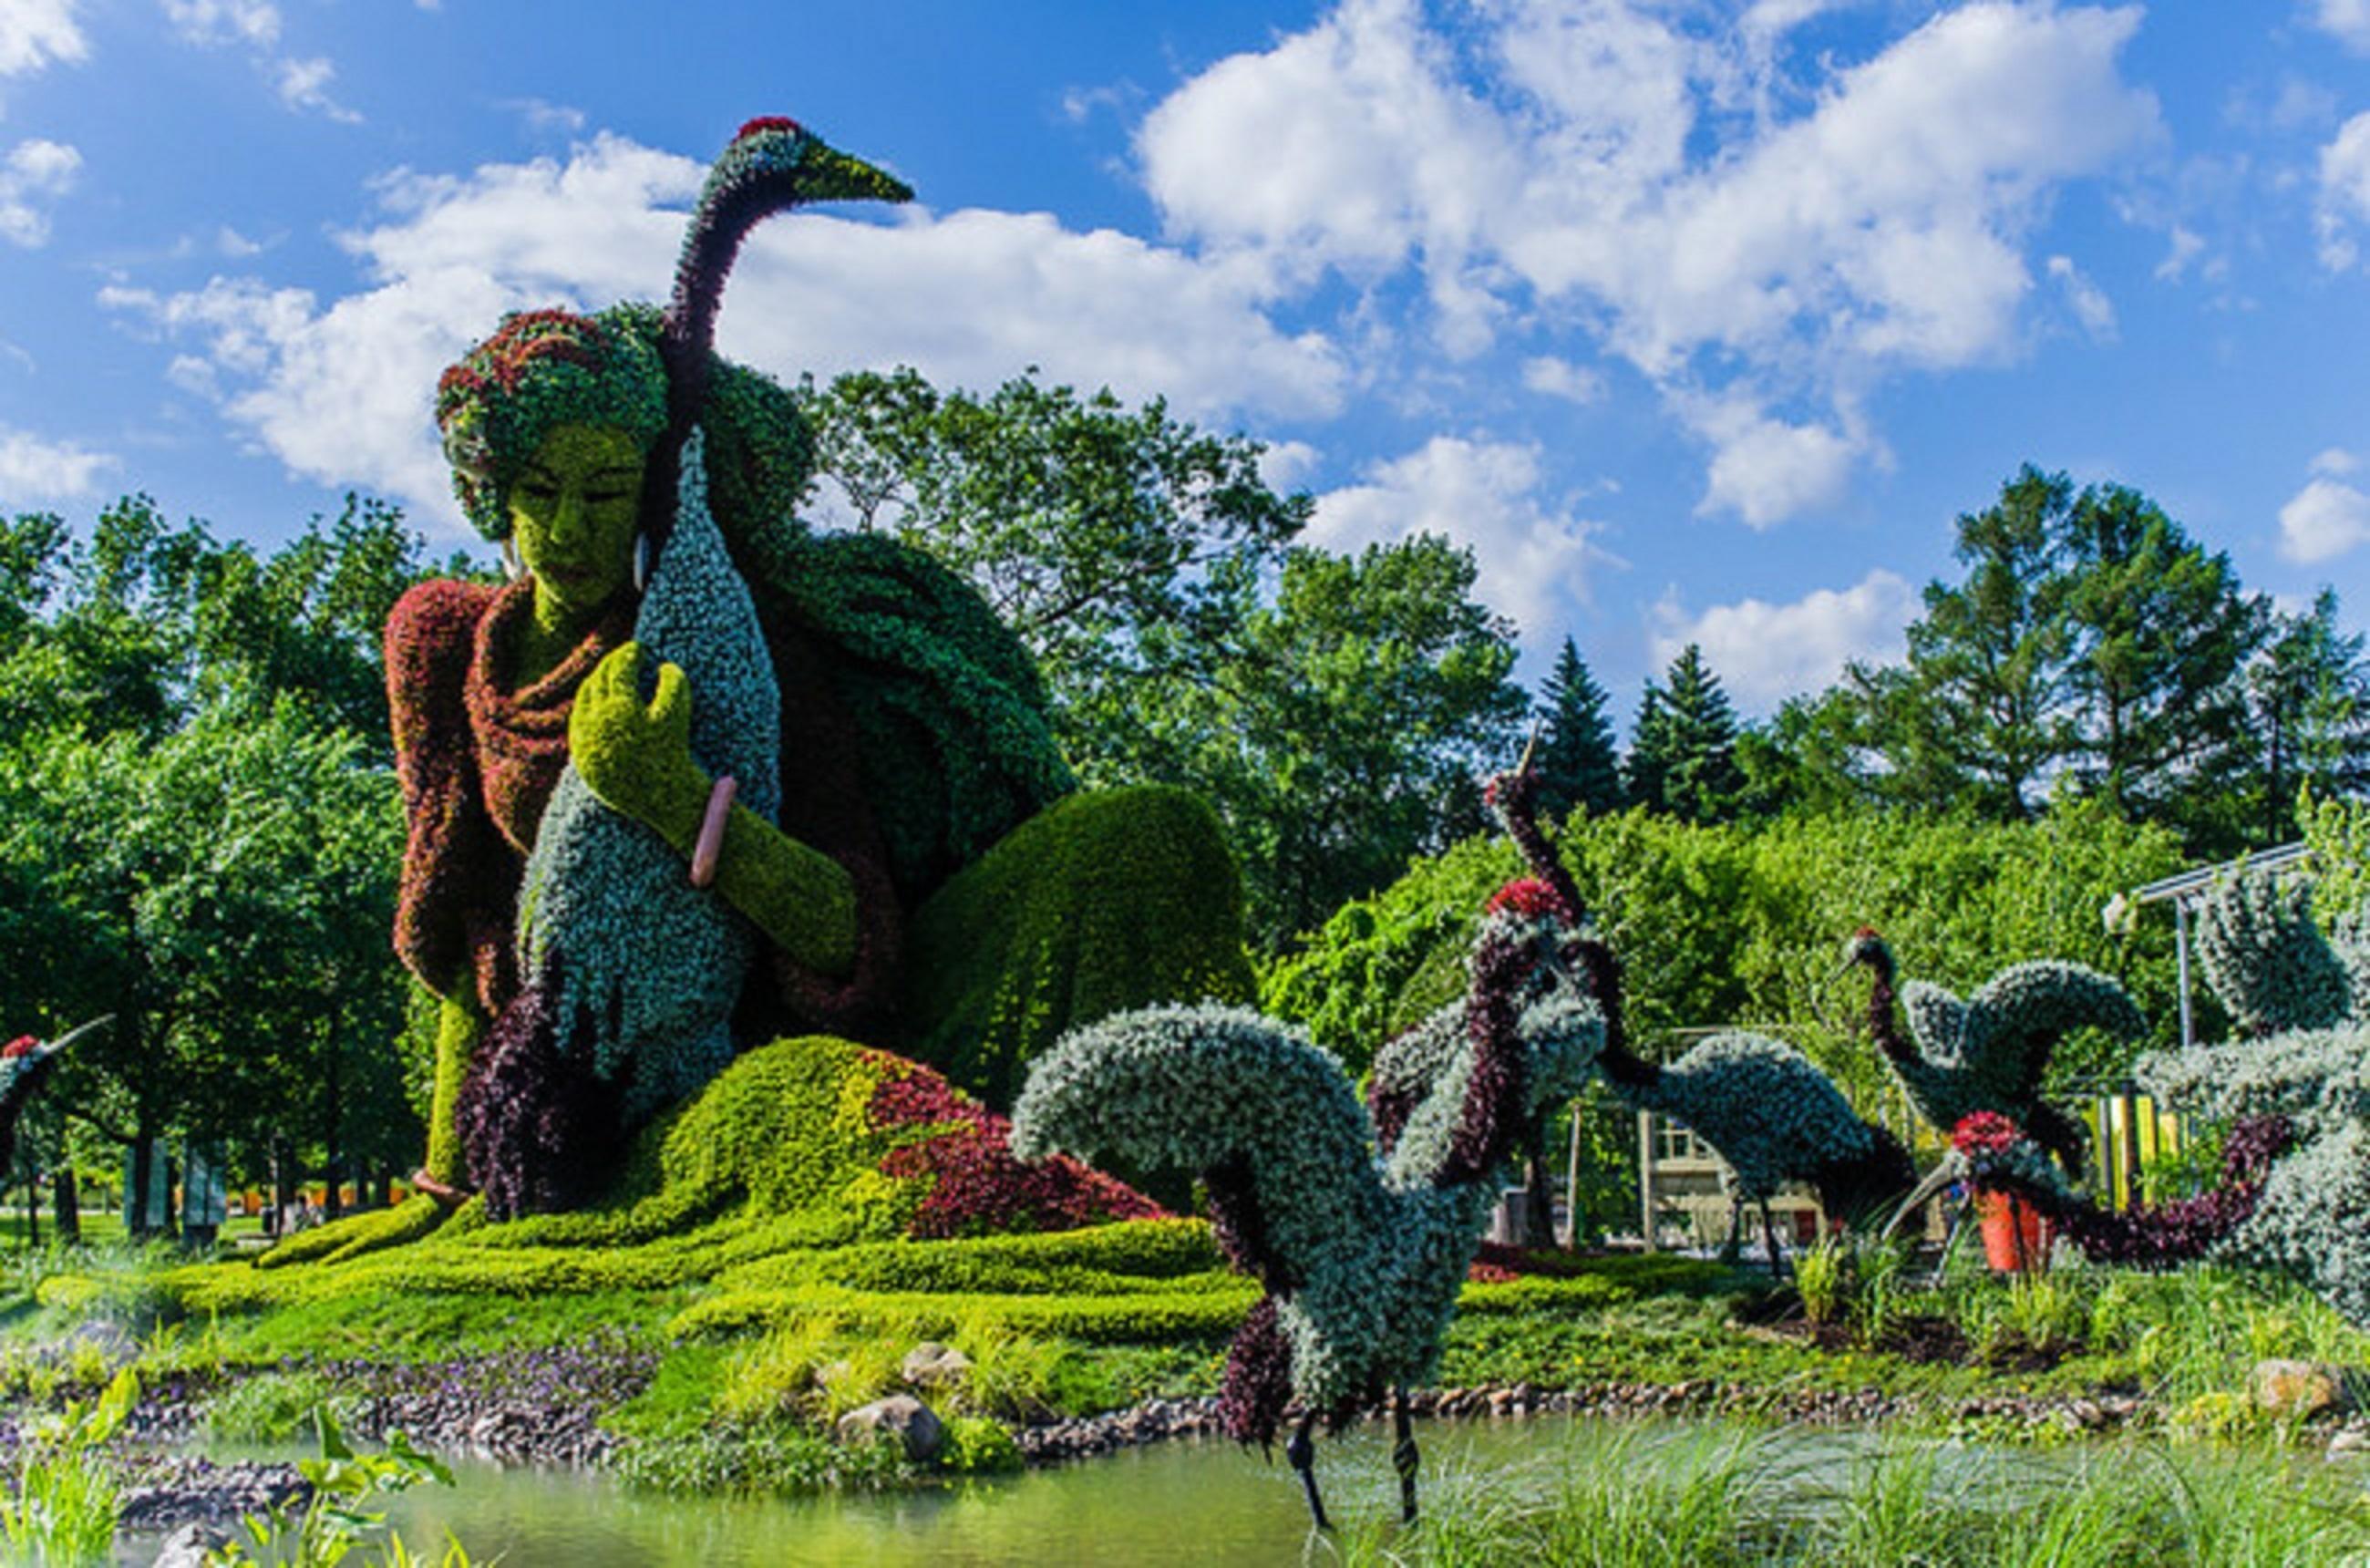 3e432d281782e020895d0a78931f71d7 - How Big Is The Botanical Gardens